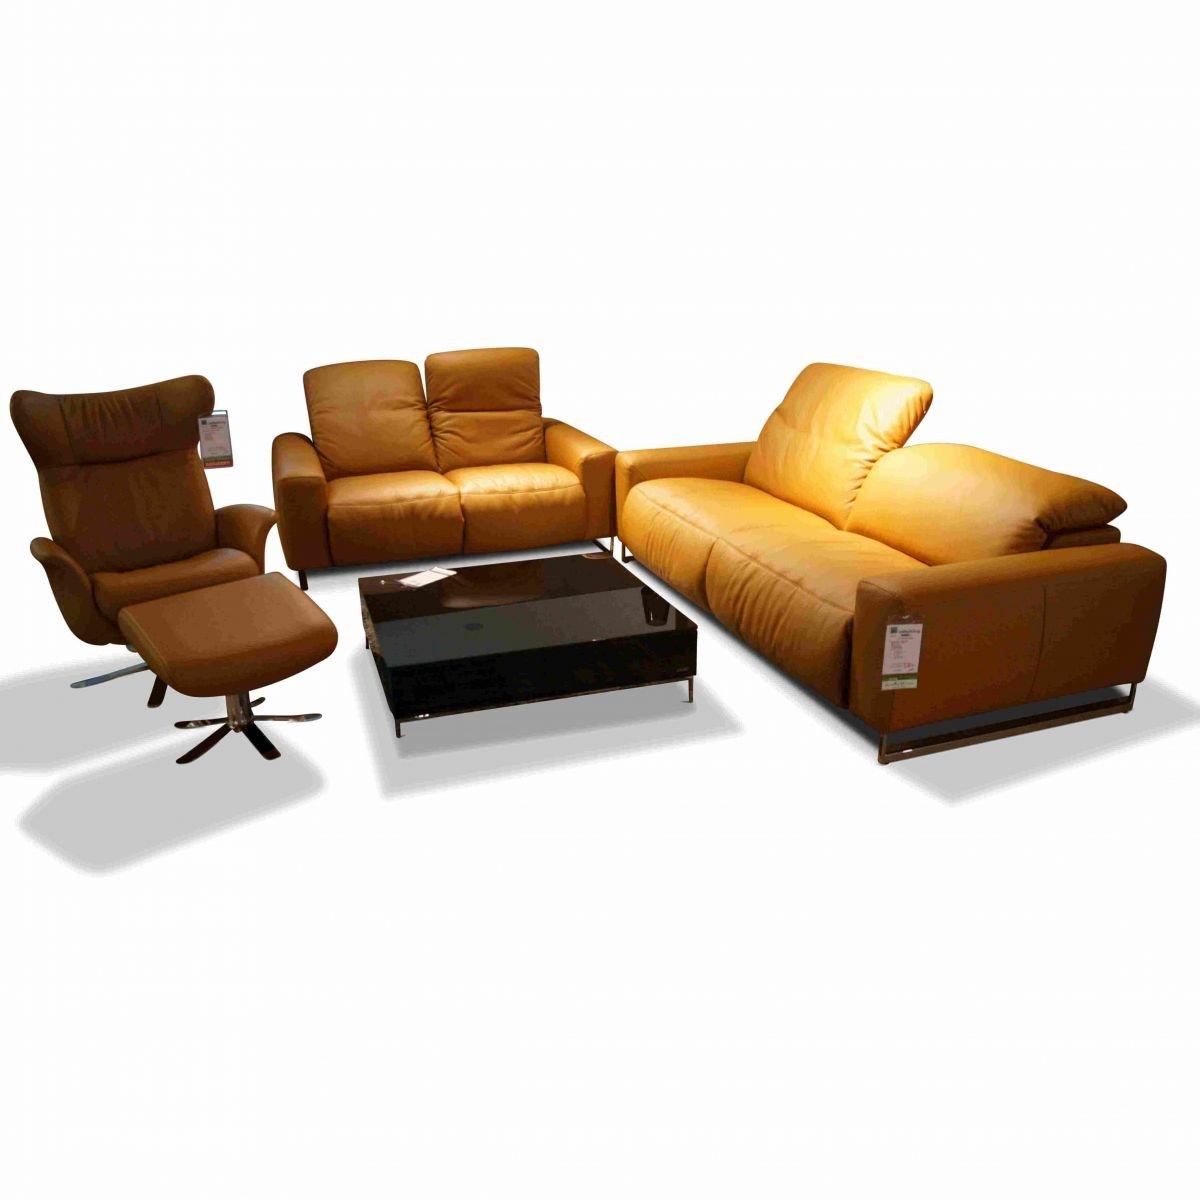 JOOP! Garnitur 8105 (3-Sitzer, 2-Sitzer, Sessel, Hocker ...